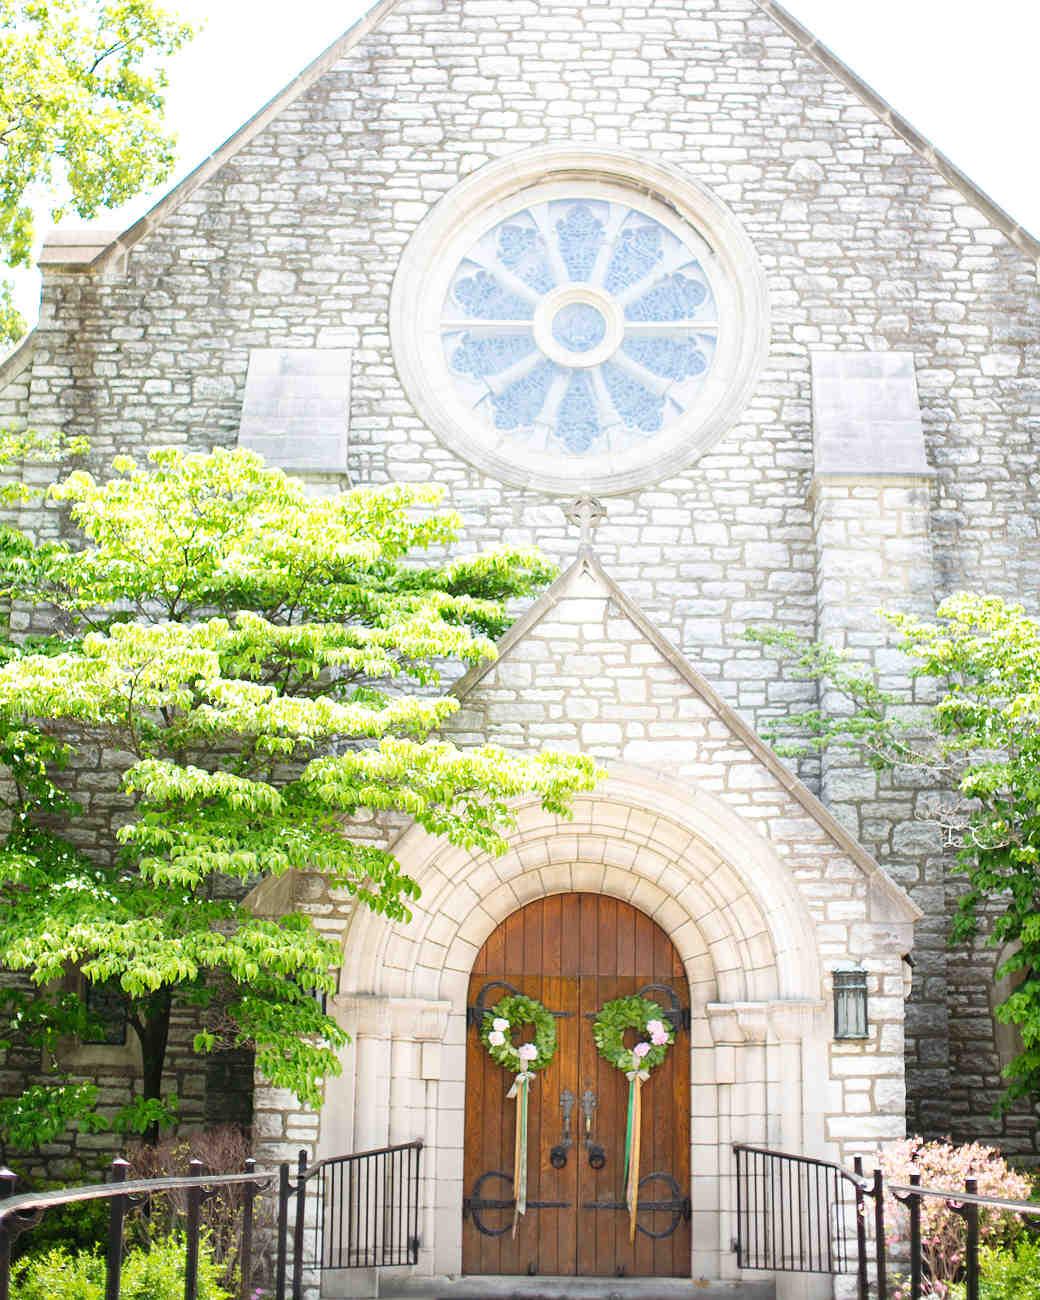 courtney-michael-wedding-04-s111677-0215.jpg